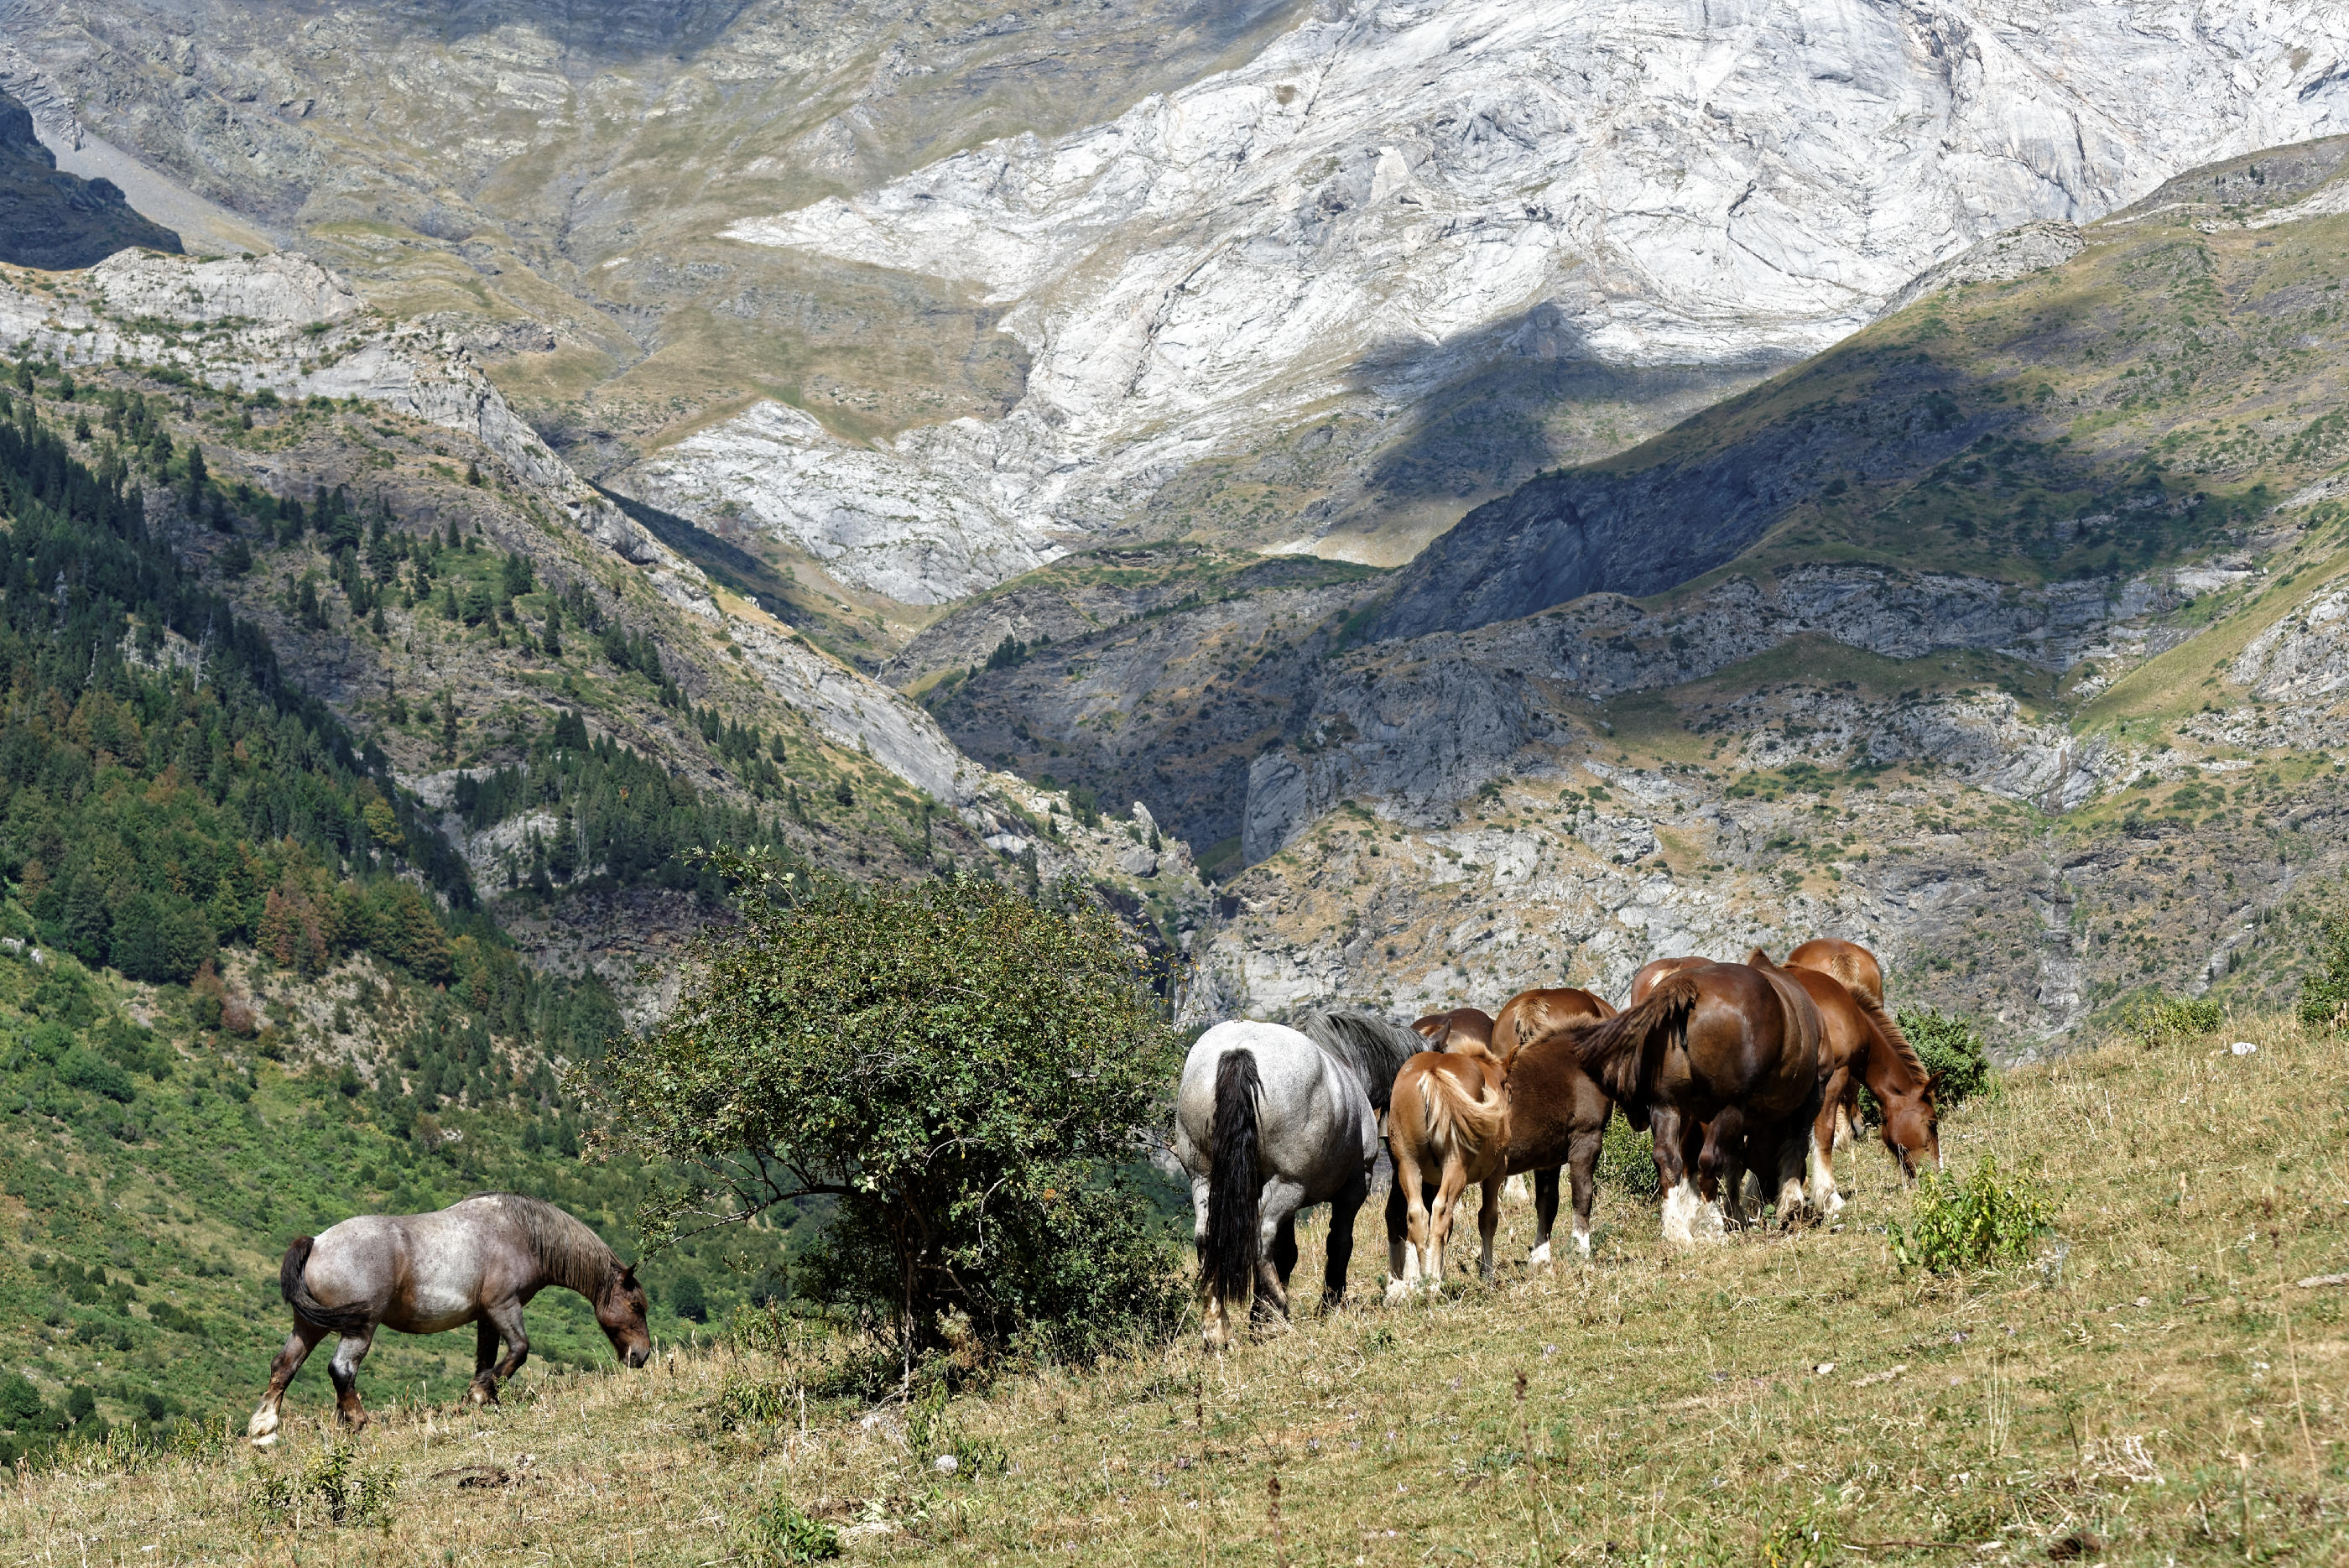 160910-marche-cascade-du-cinca-et-de-la-larri-sobrarbe-aragon-165